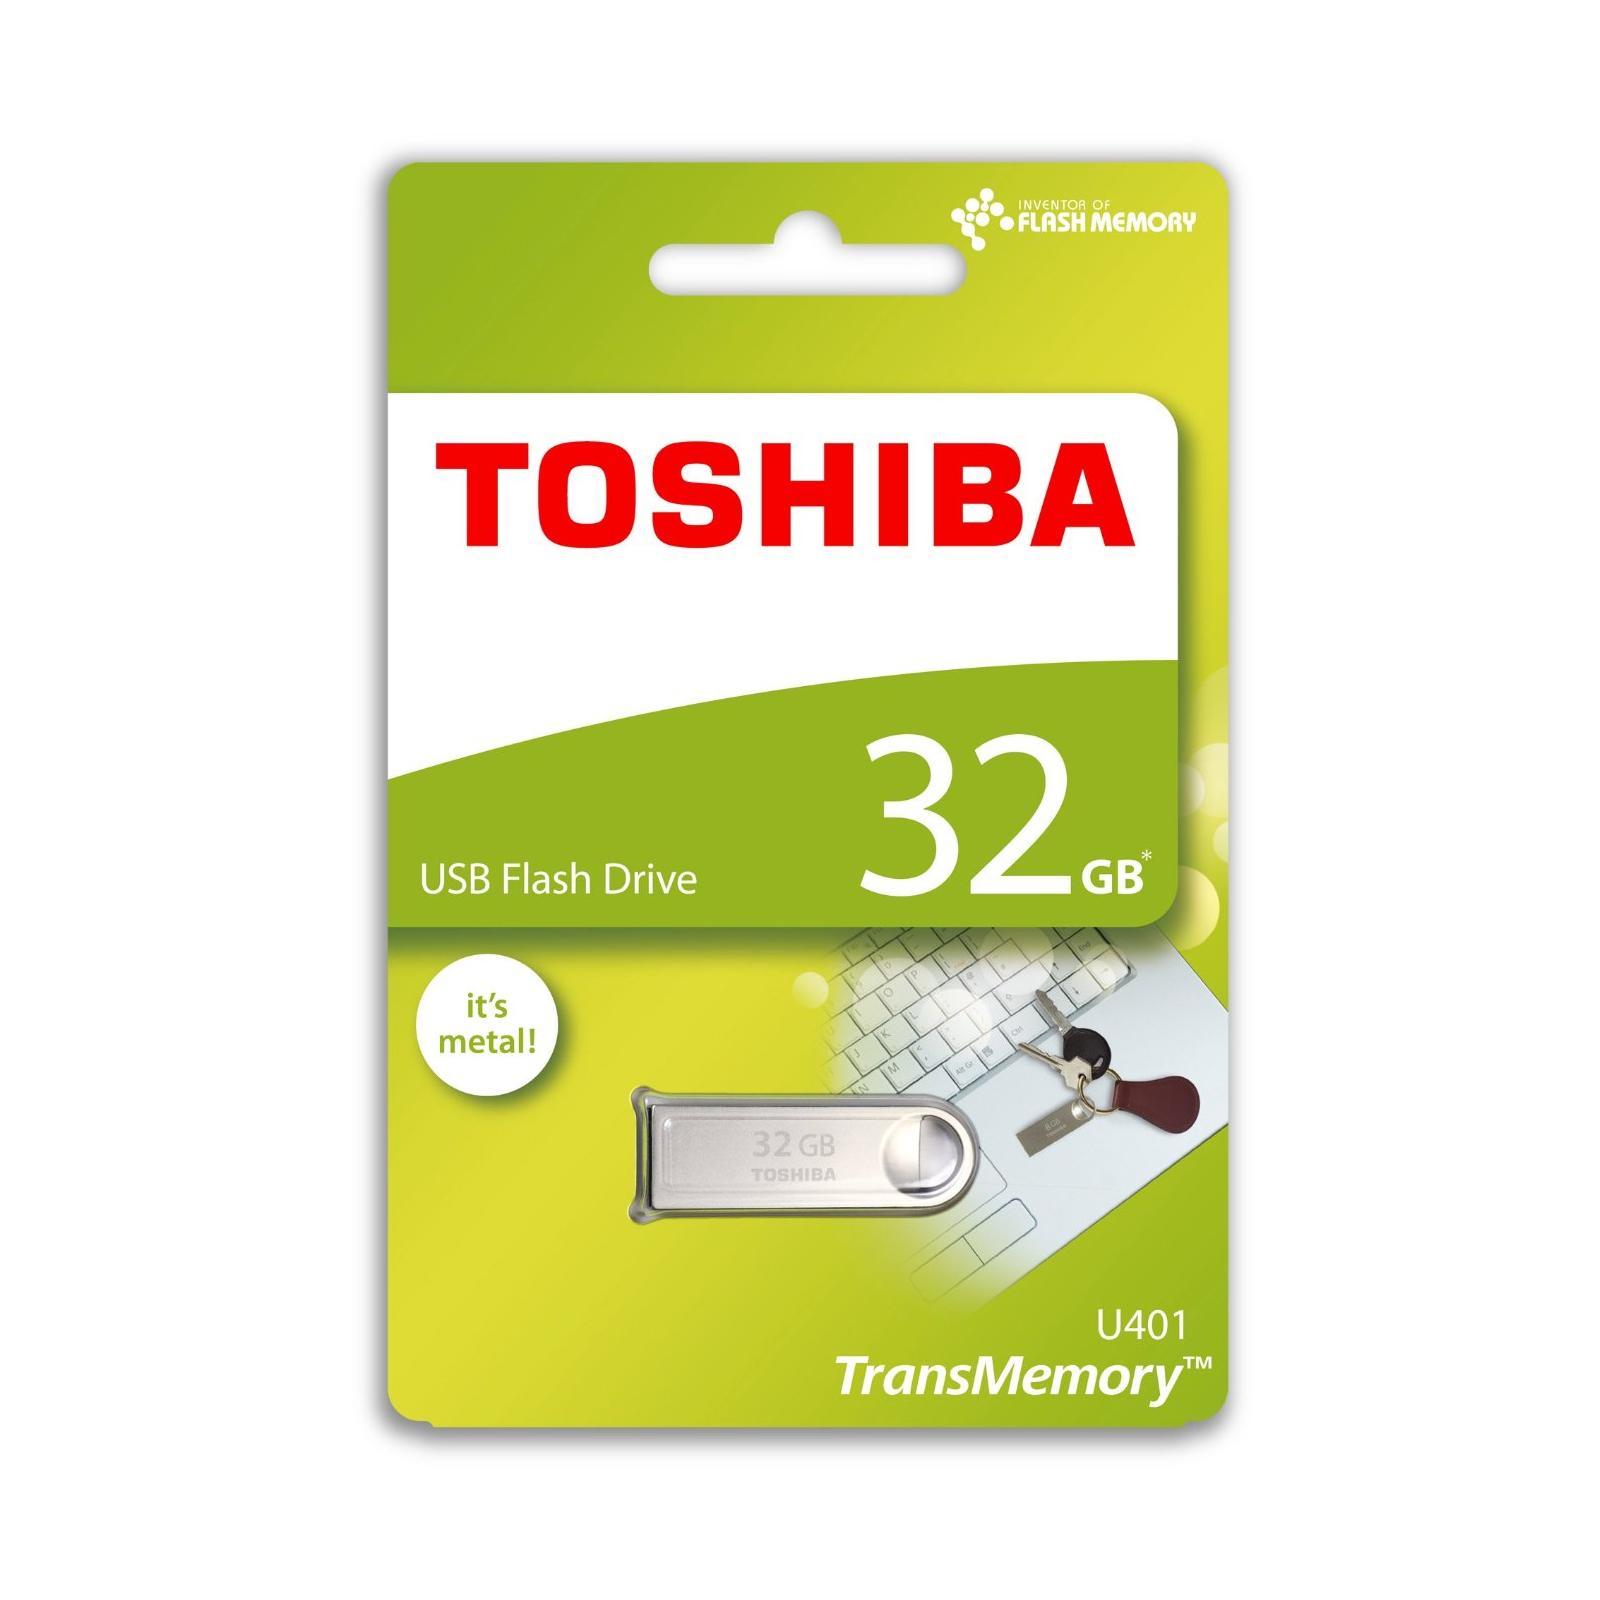 USB флеш накопитель TOSHIBA 32GB Owari Metal USB 2.0 (THN-U401S0320E4) изображение 4